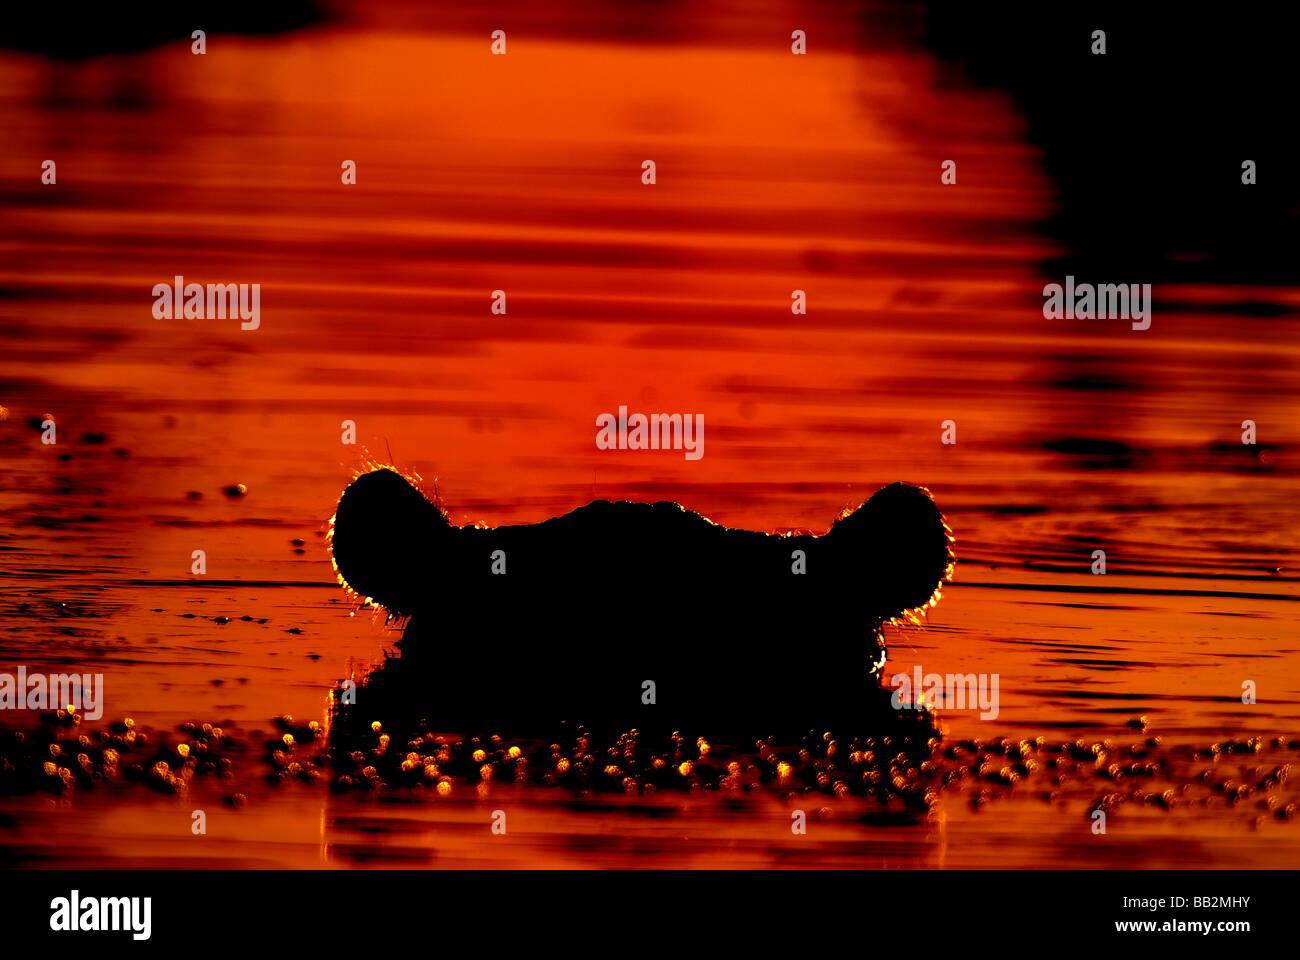 Silhouette of a Hippopotamus at sunset in Khwai river, Botswana. - Stock Image